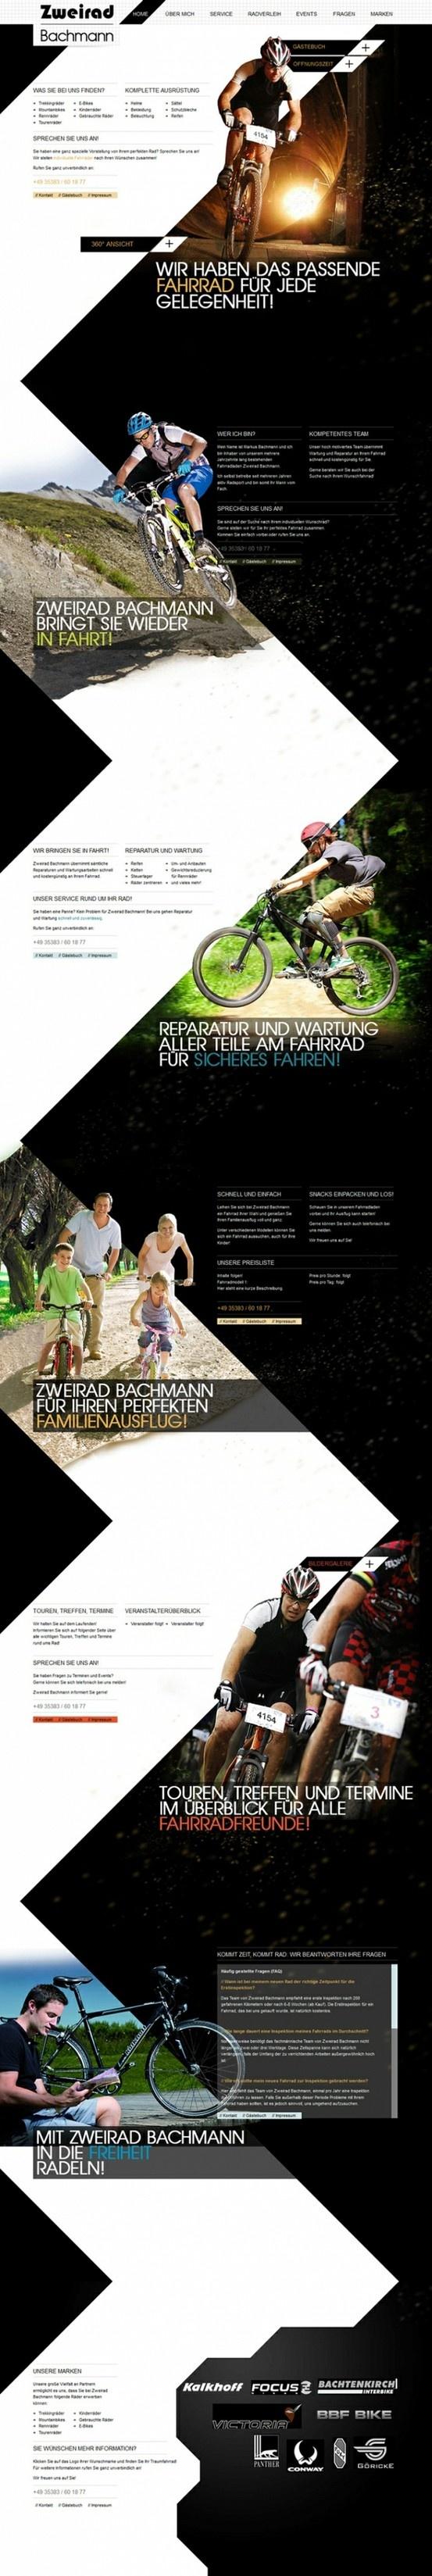 Zweiradhandel Bachmann | Designed by Stephanie Zander